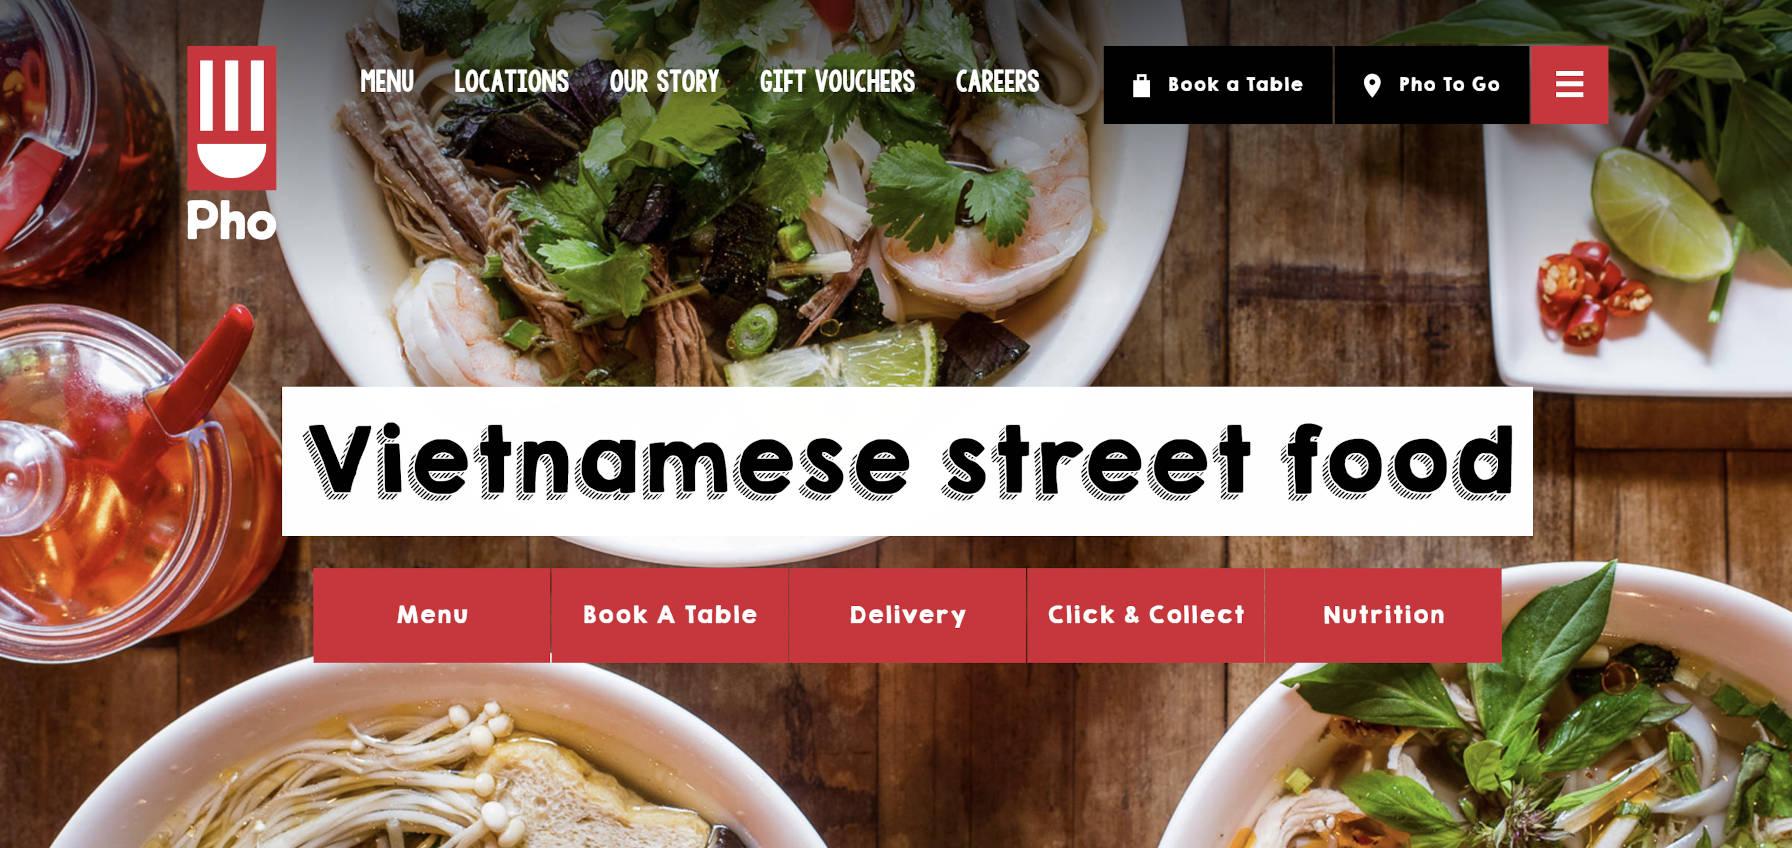 Screenshot of the Pho Cafe website page header.